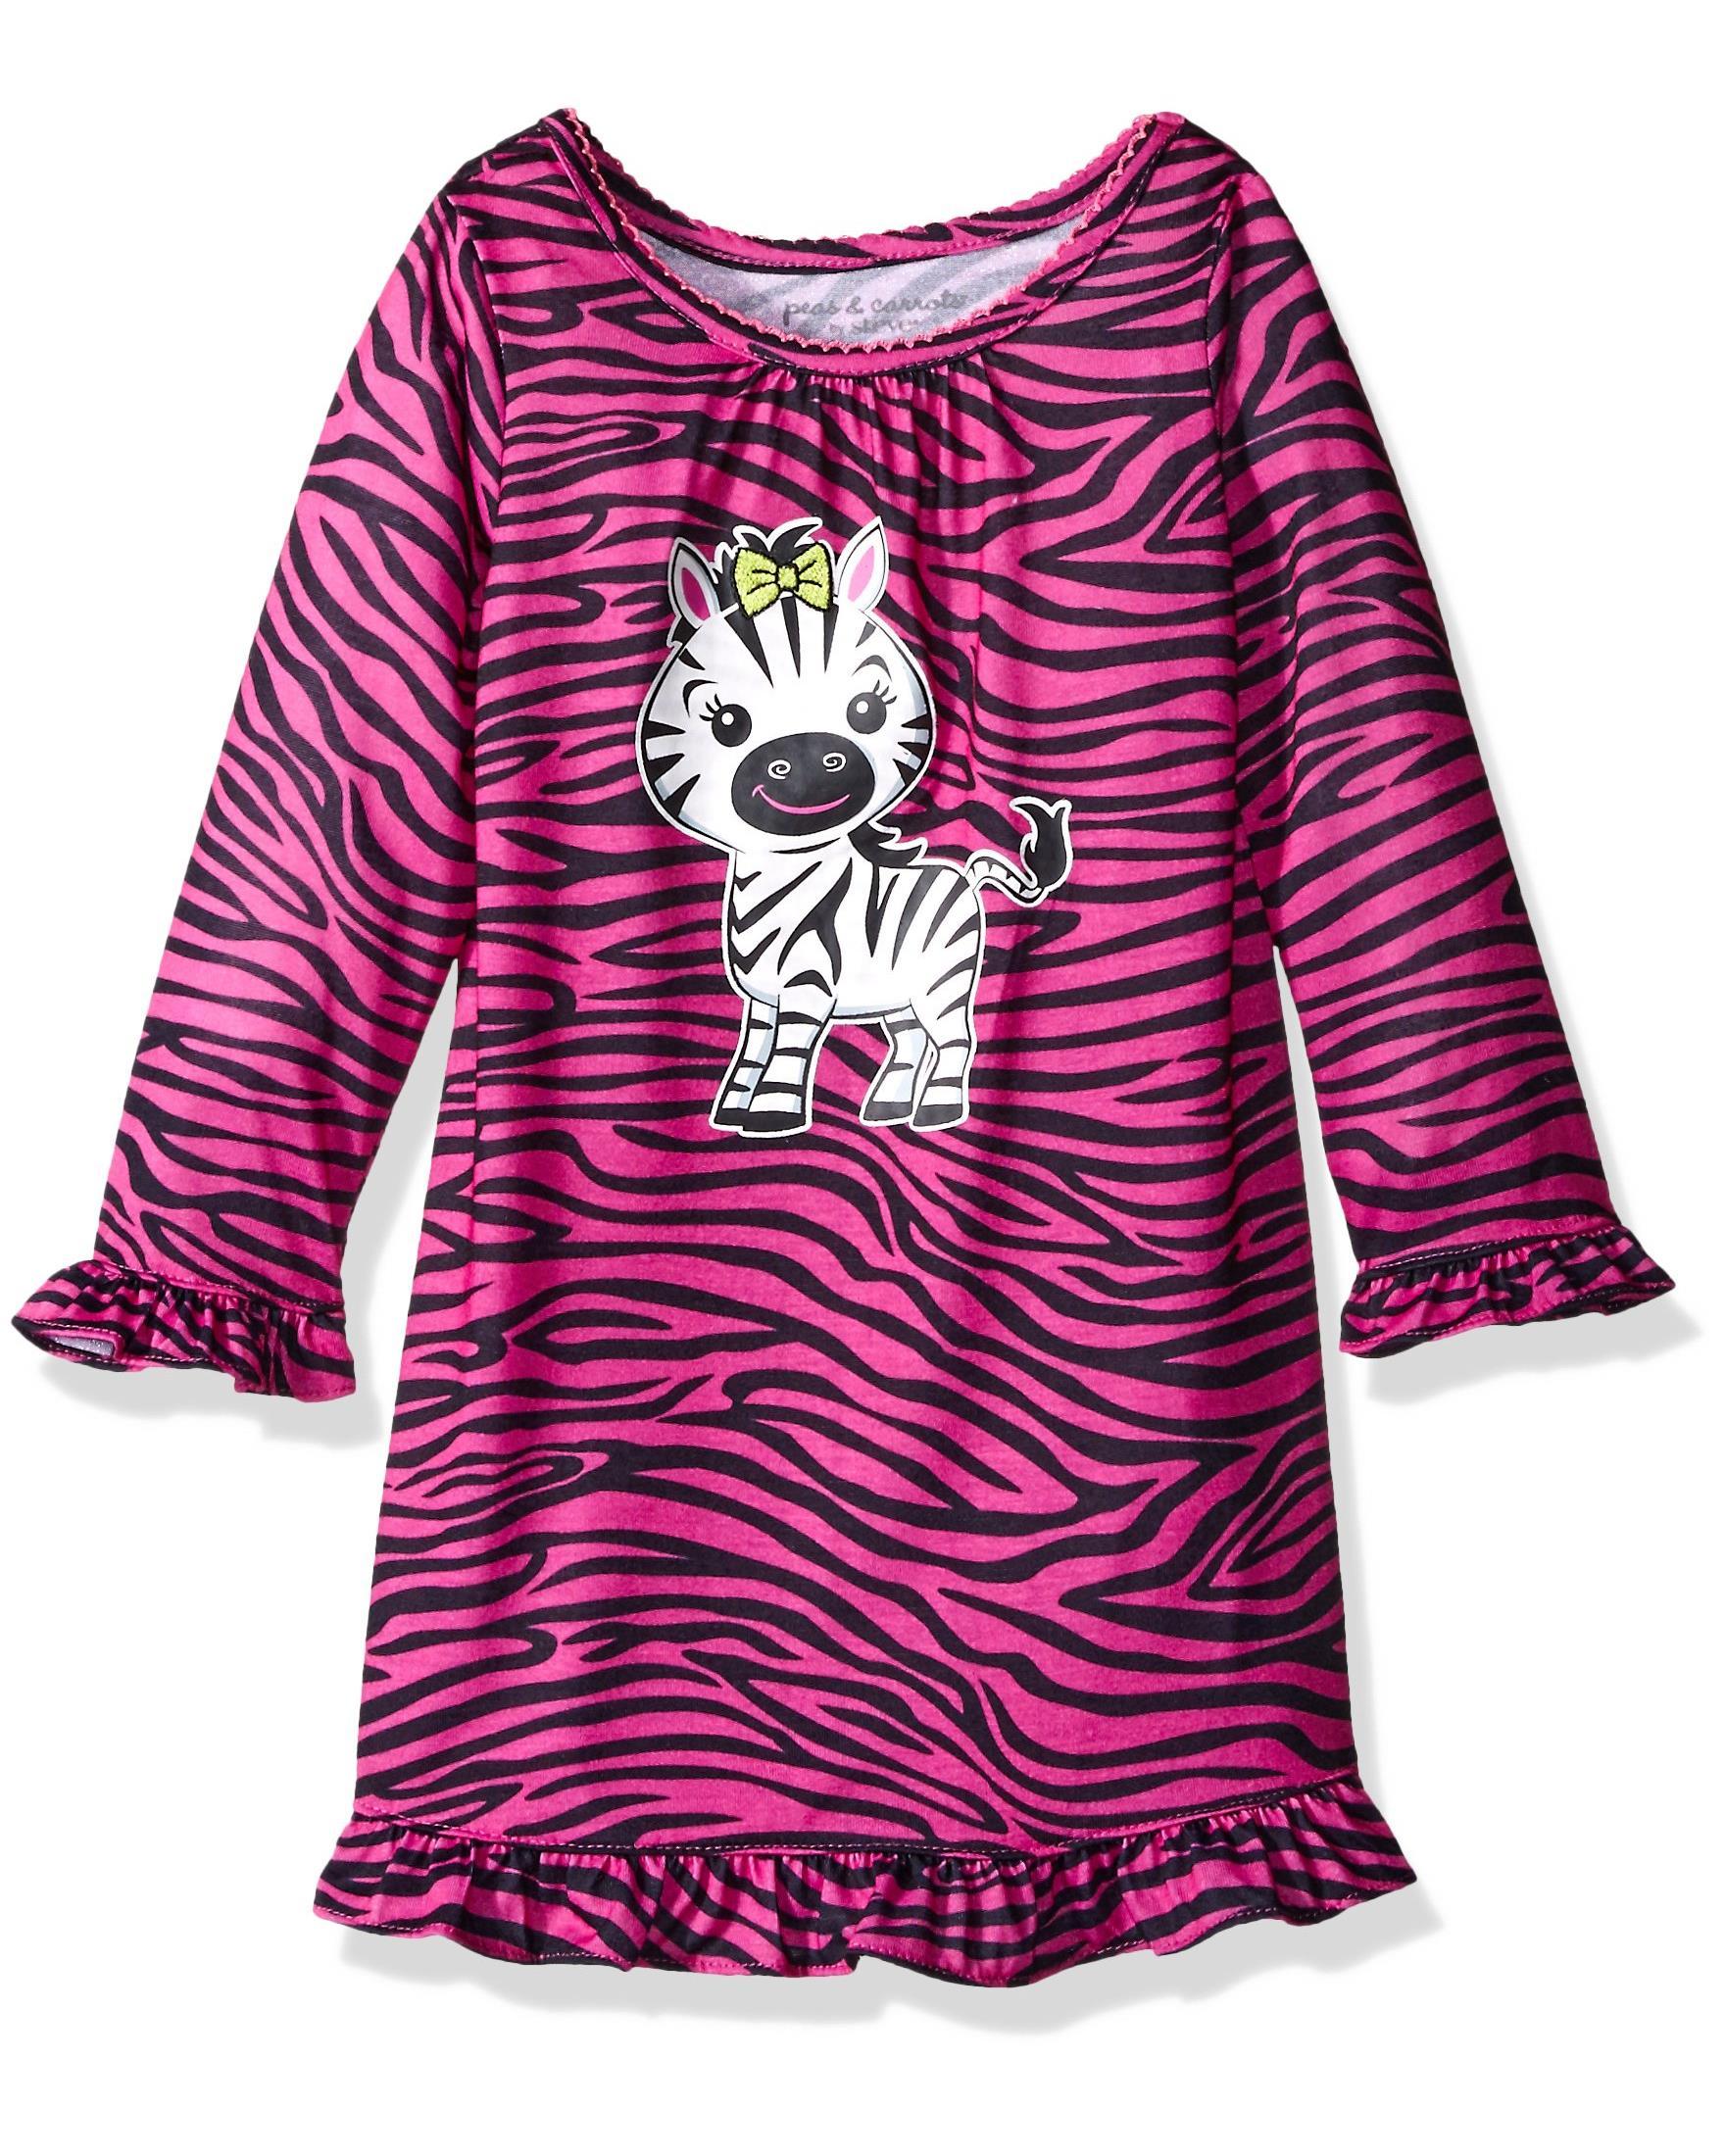 Komar Kids Girls' Zebra Gown, Pink, Size: 3T